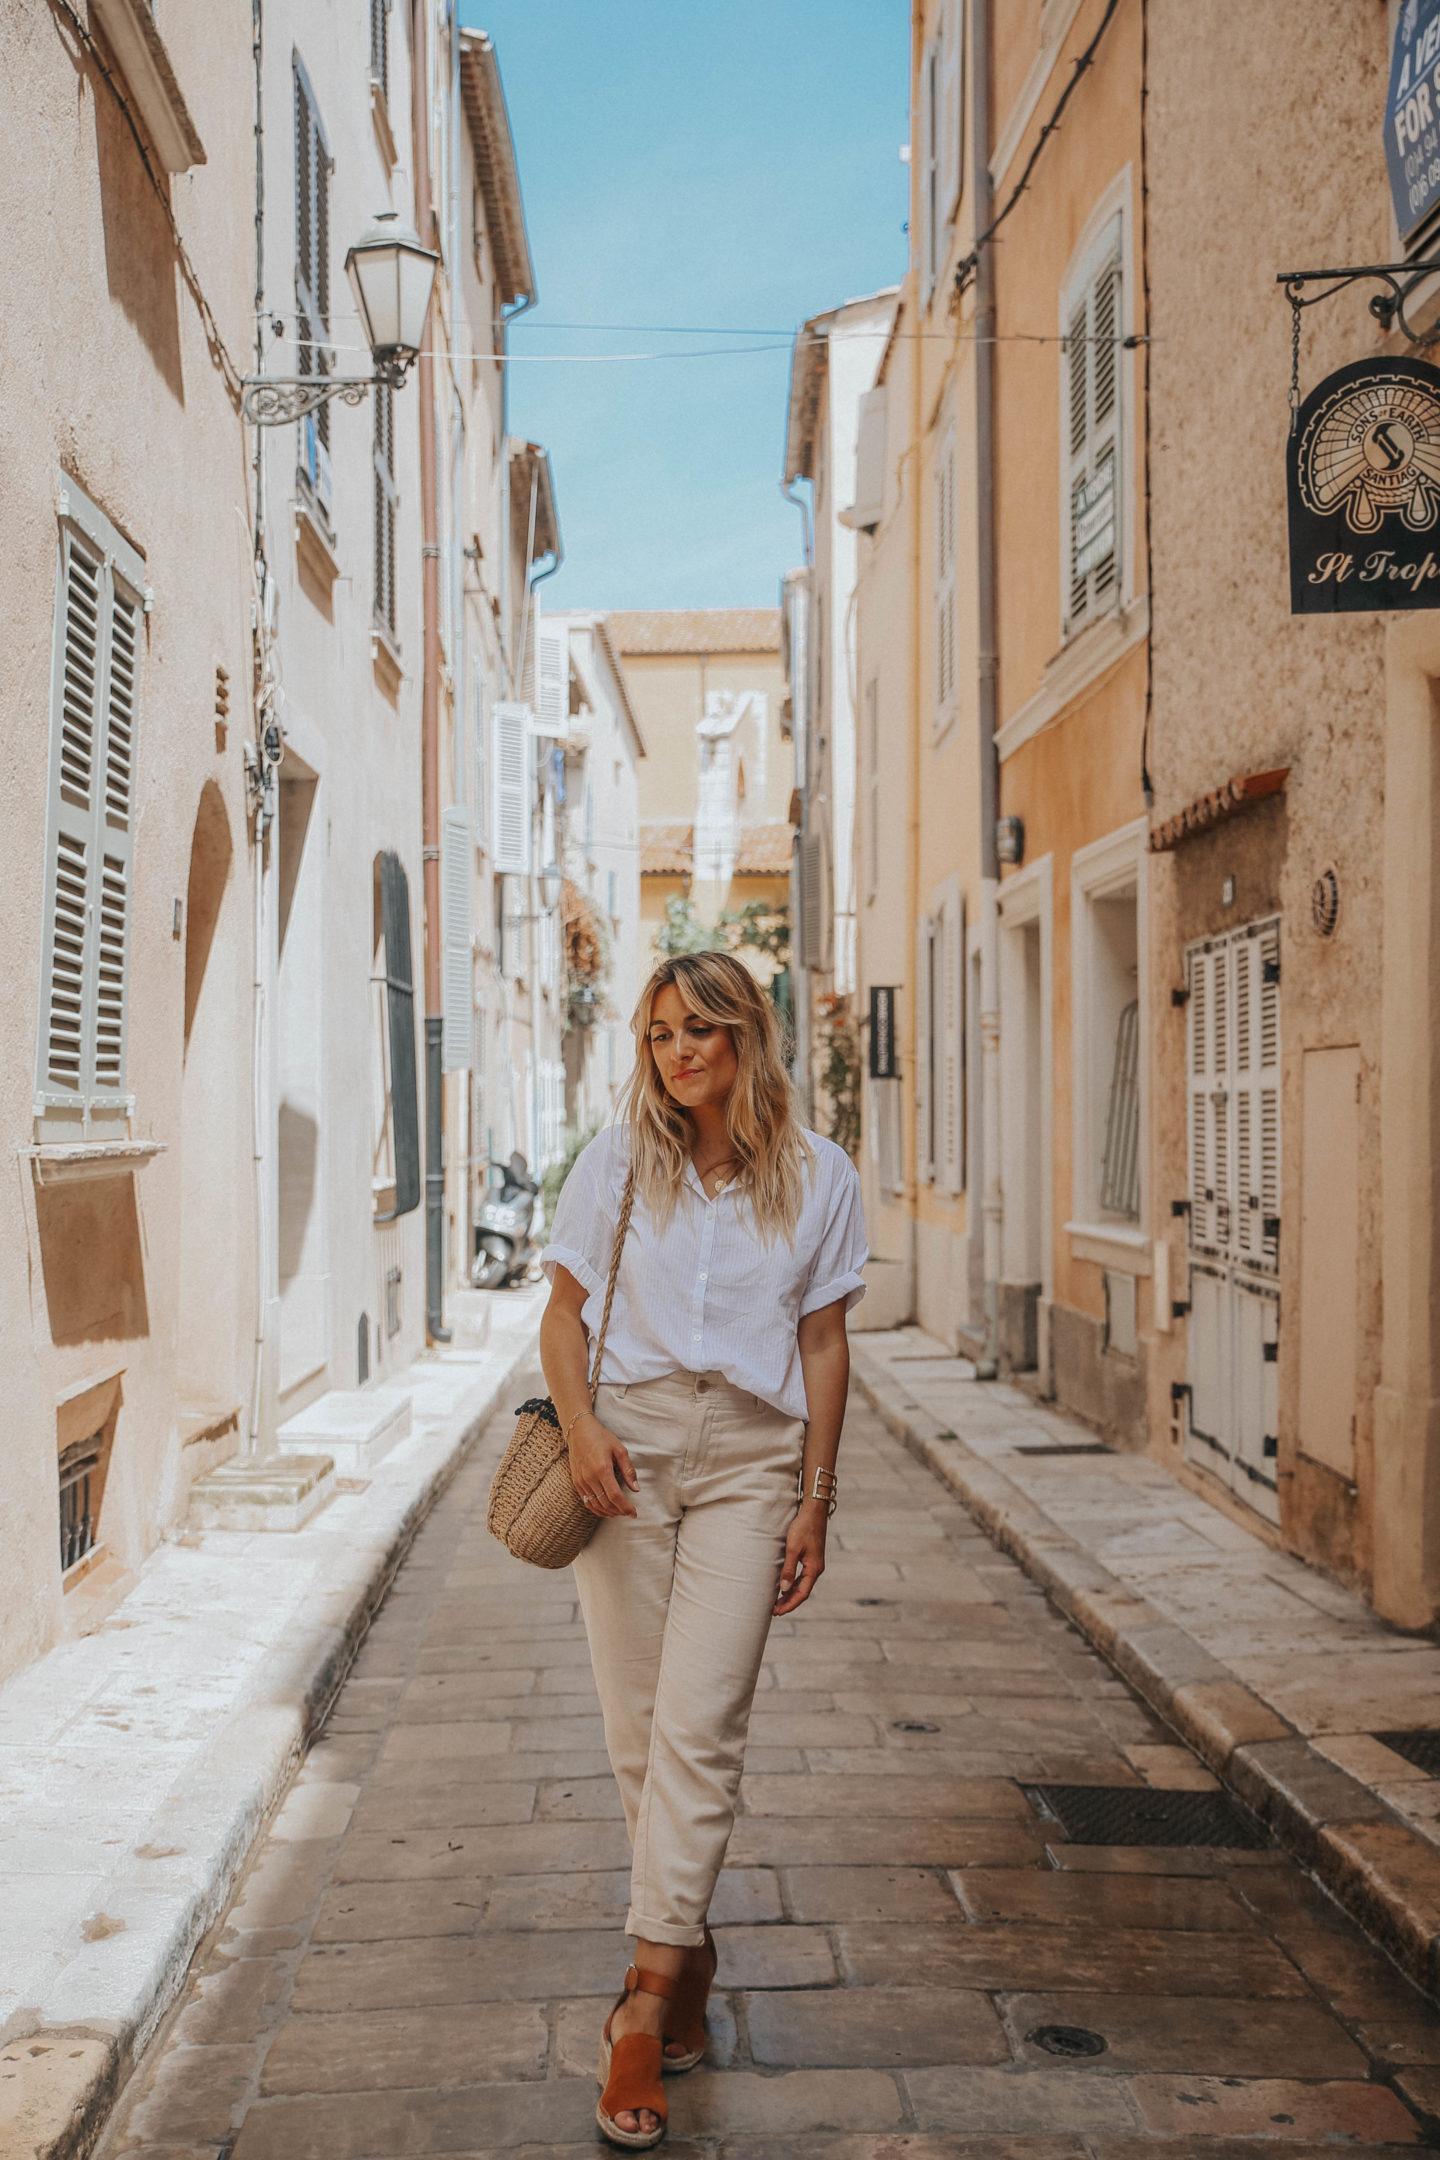 Gap - Blondie Baby blog mode Paris et voyages